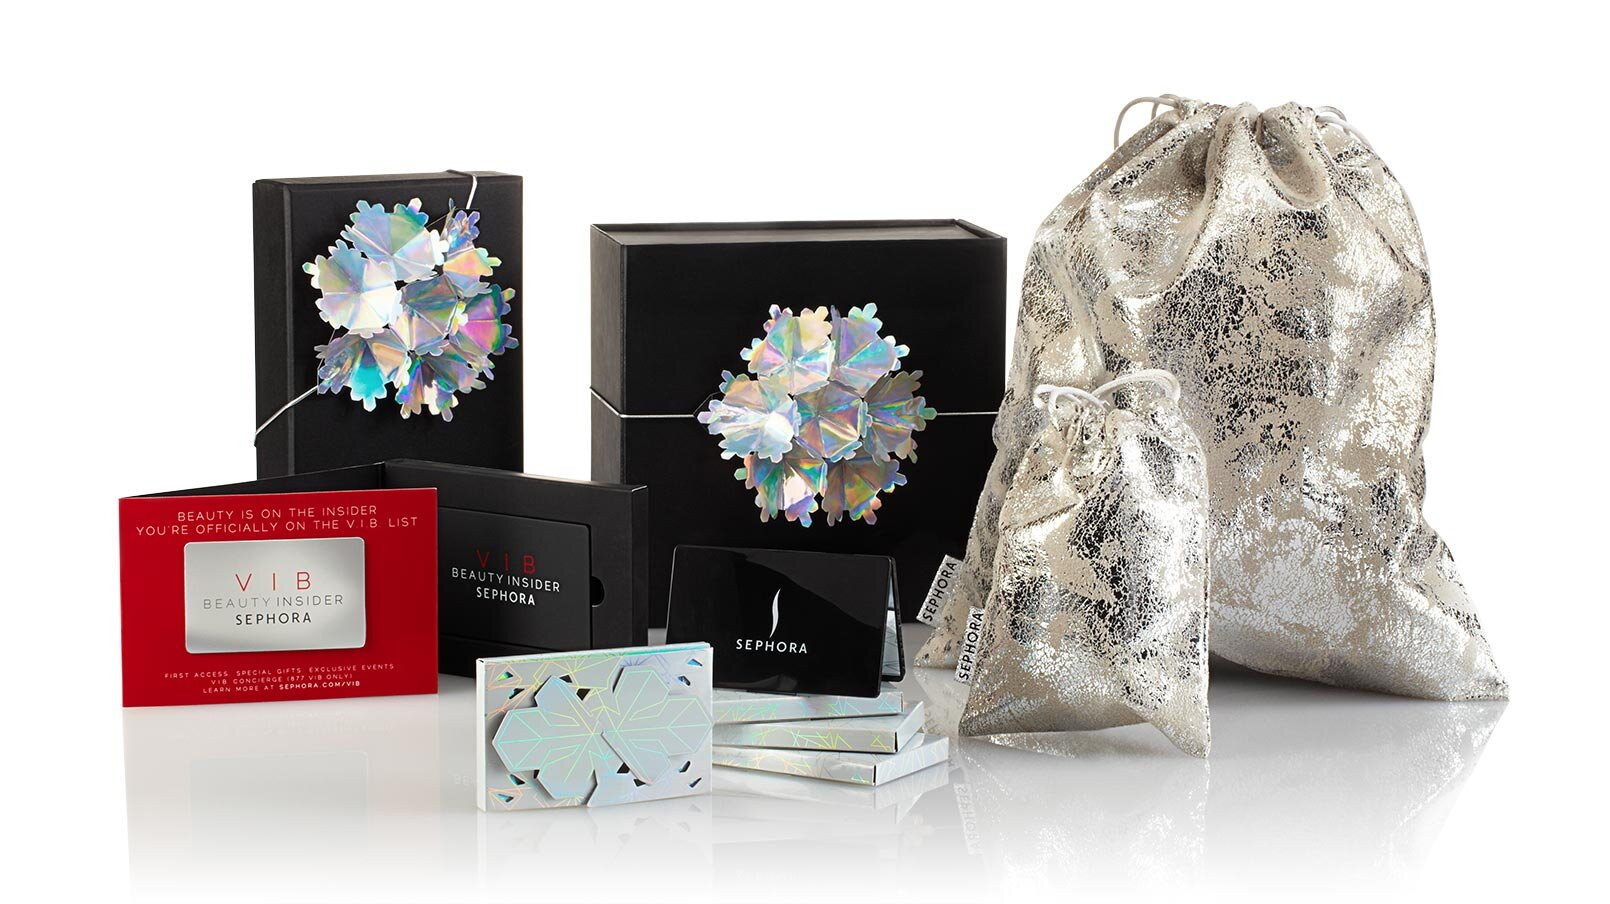 Sephora-snowflake-holiday-gift-card-packaging-company-design-5.jpg